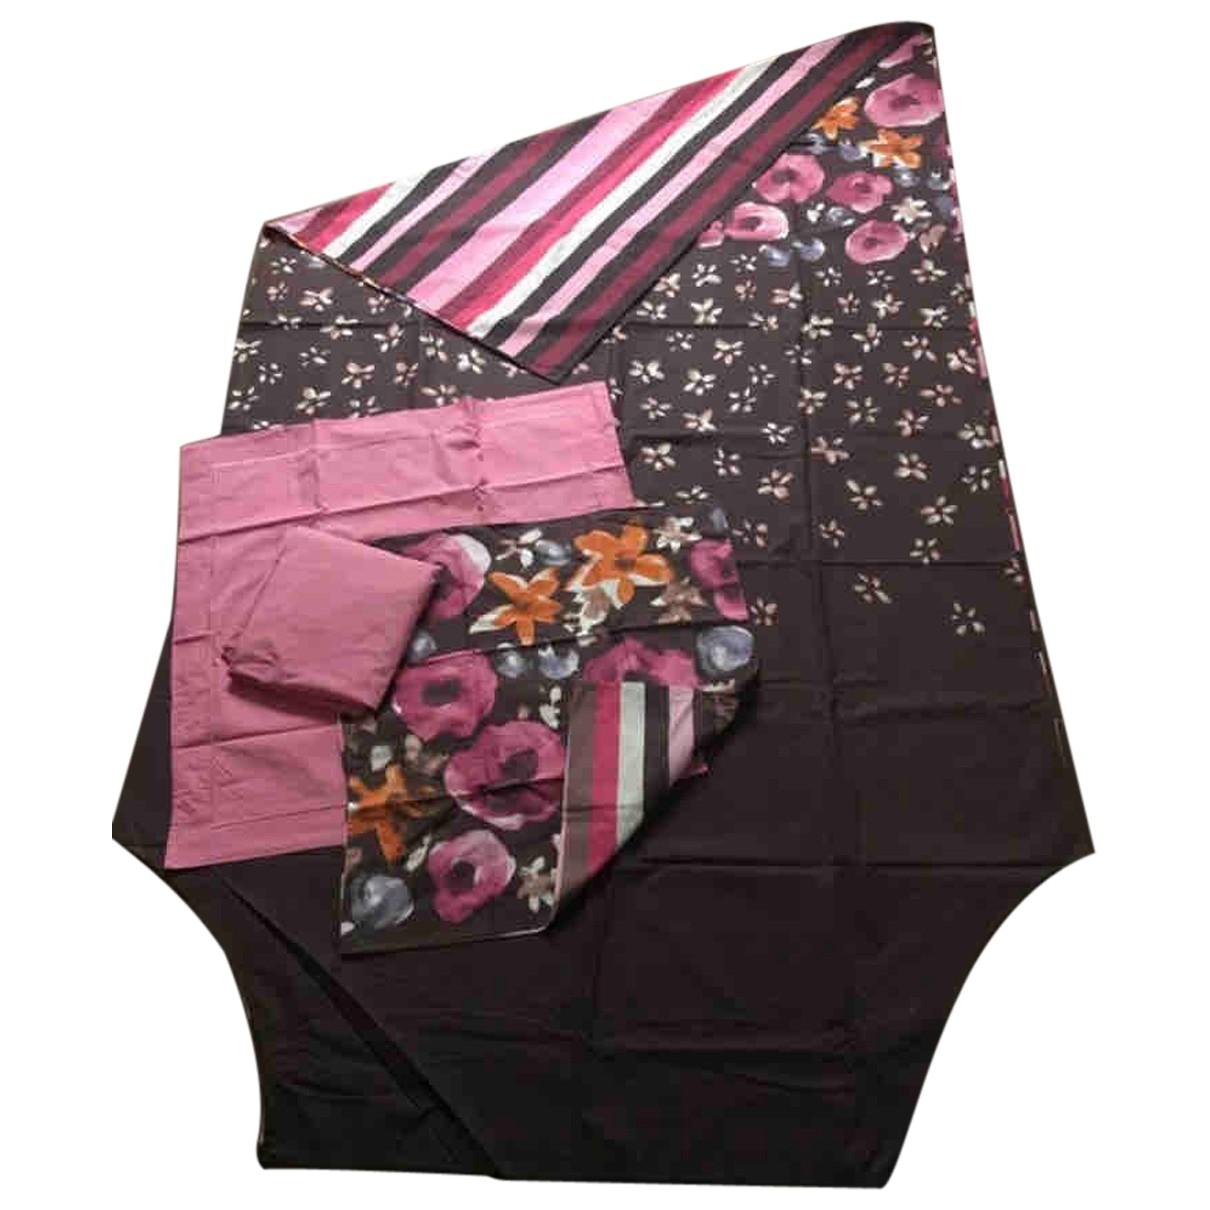 Textil de hogar Sonia Rykiel